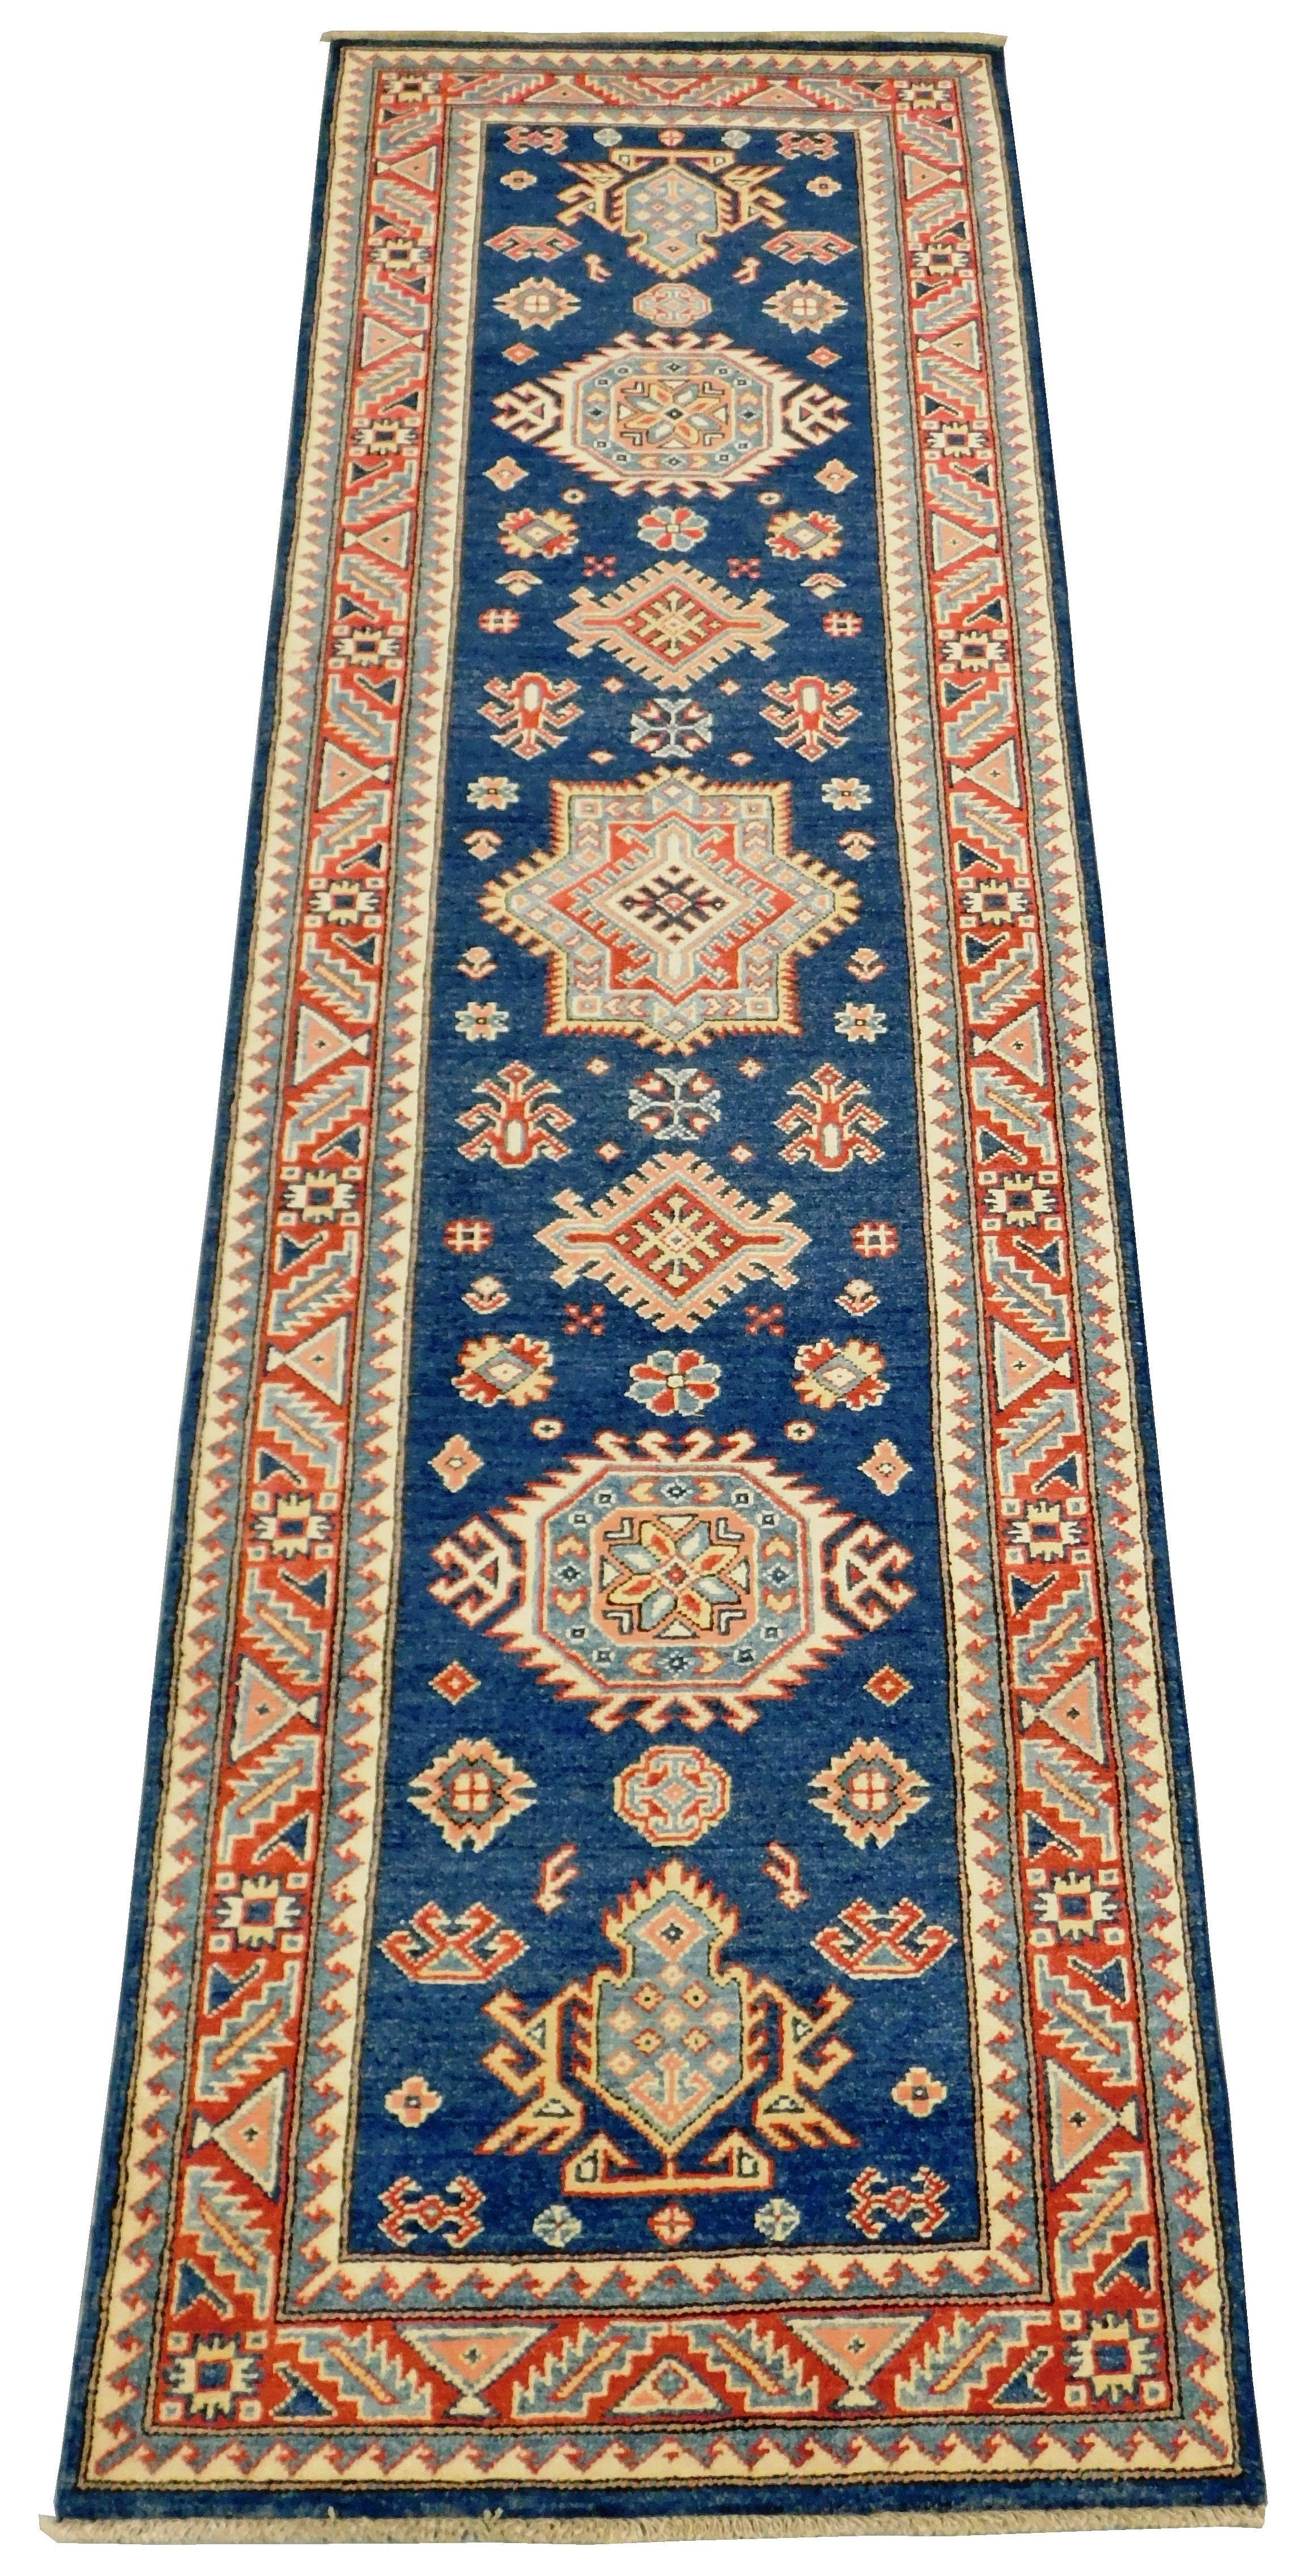 "RUG: Uzbek Kazak runner, 2' 10"" x 9' 9"", ocean blue field, ensconced in red serrated geometric border, serrated geometric medallions."